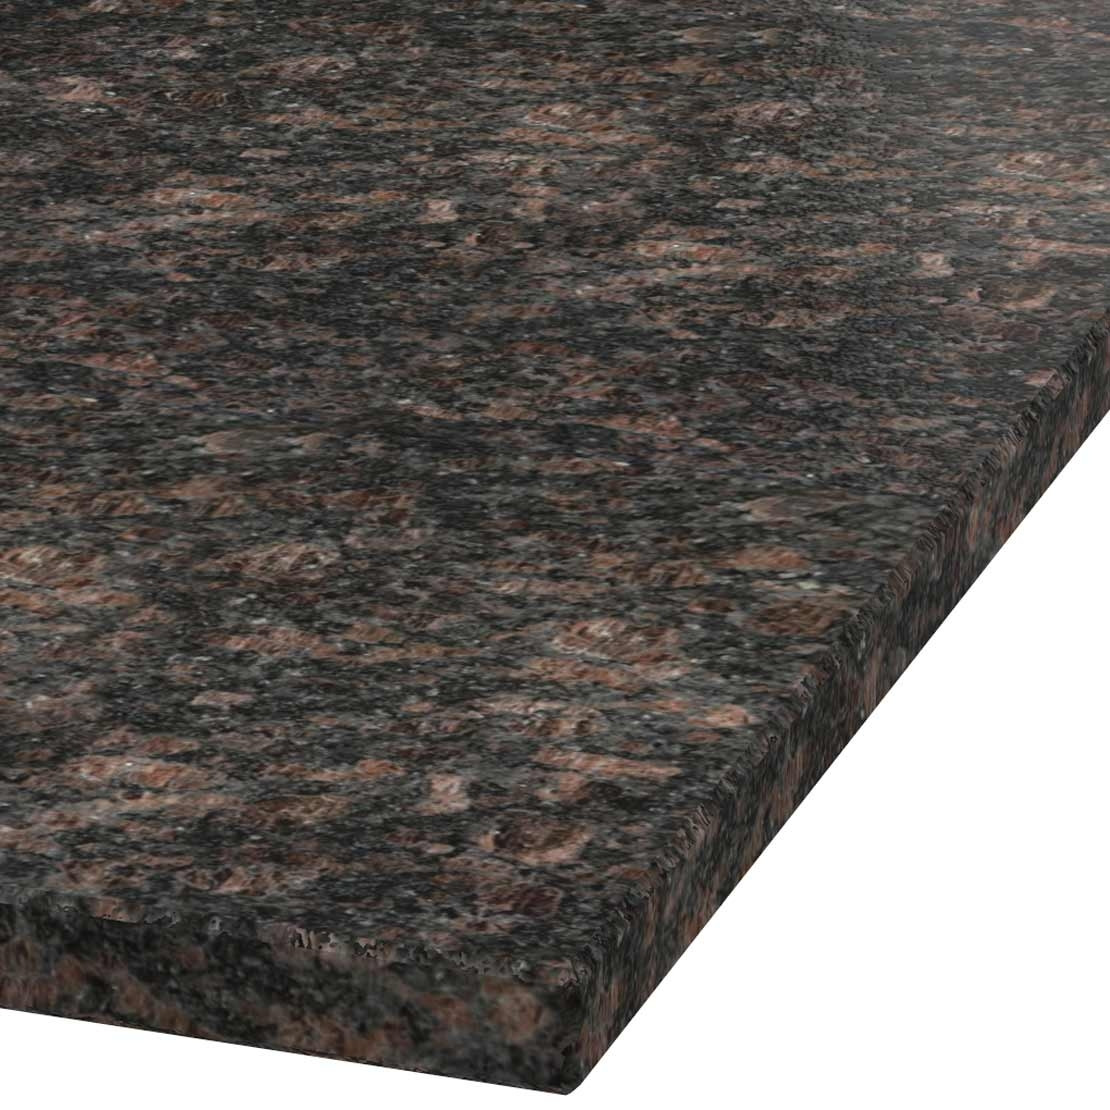 Blad 30mm dik Tan Brown graniet (leathered)